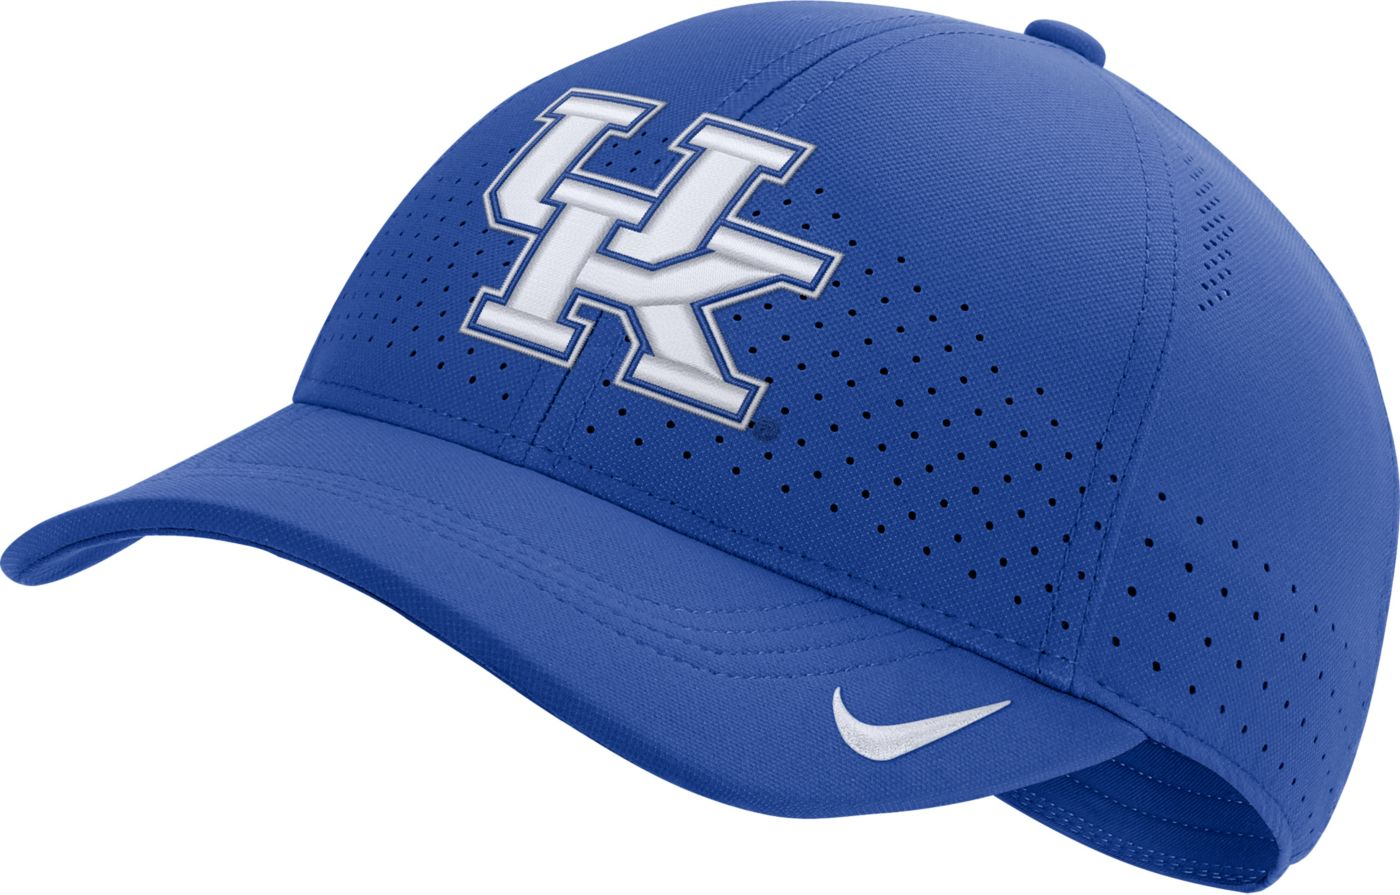 Nike Men's Kentucky Wildcats Blue Aerobill Classic99 Football Sideline Hat